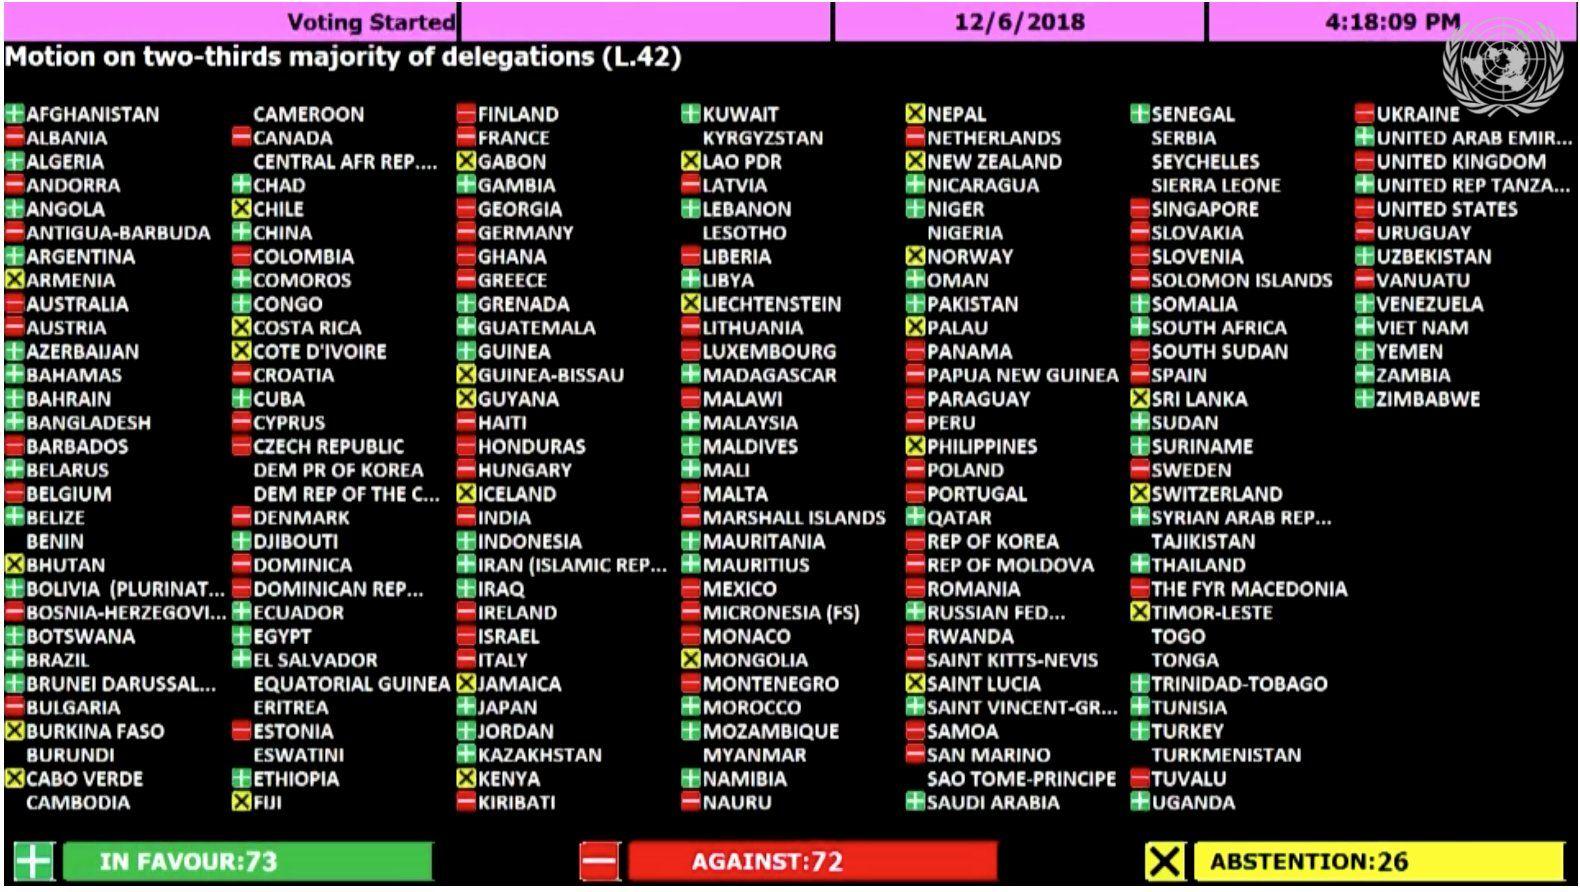 Afstemningstavlen fra FNs Generalforsamling 6. december 2018 om kravet for 2/3-flertal.